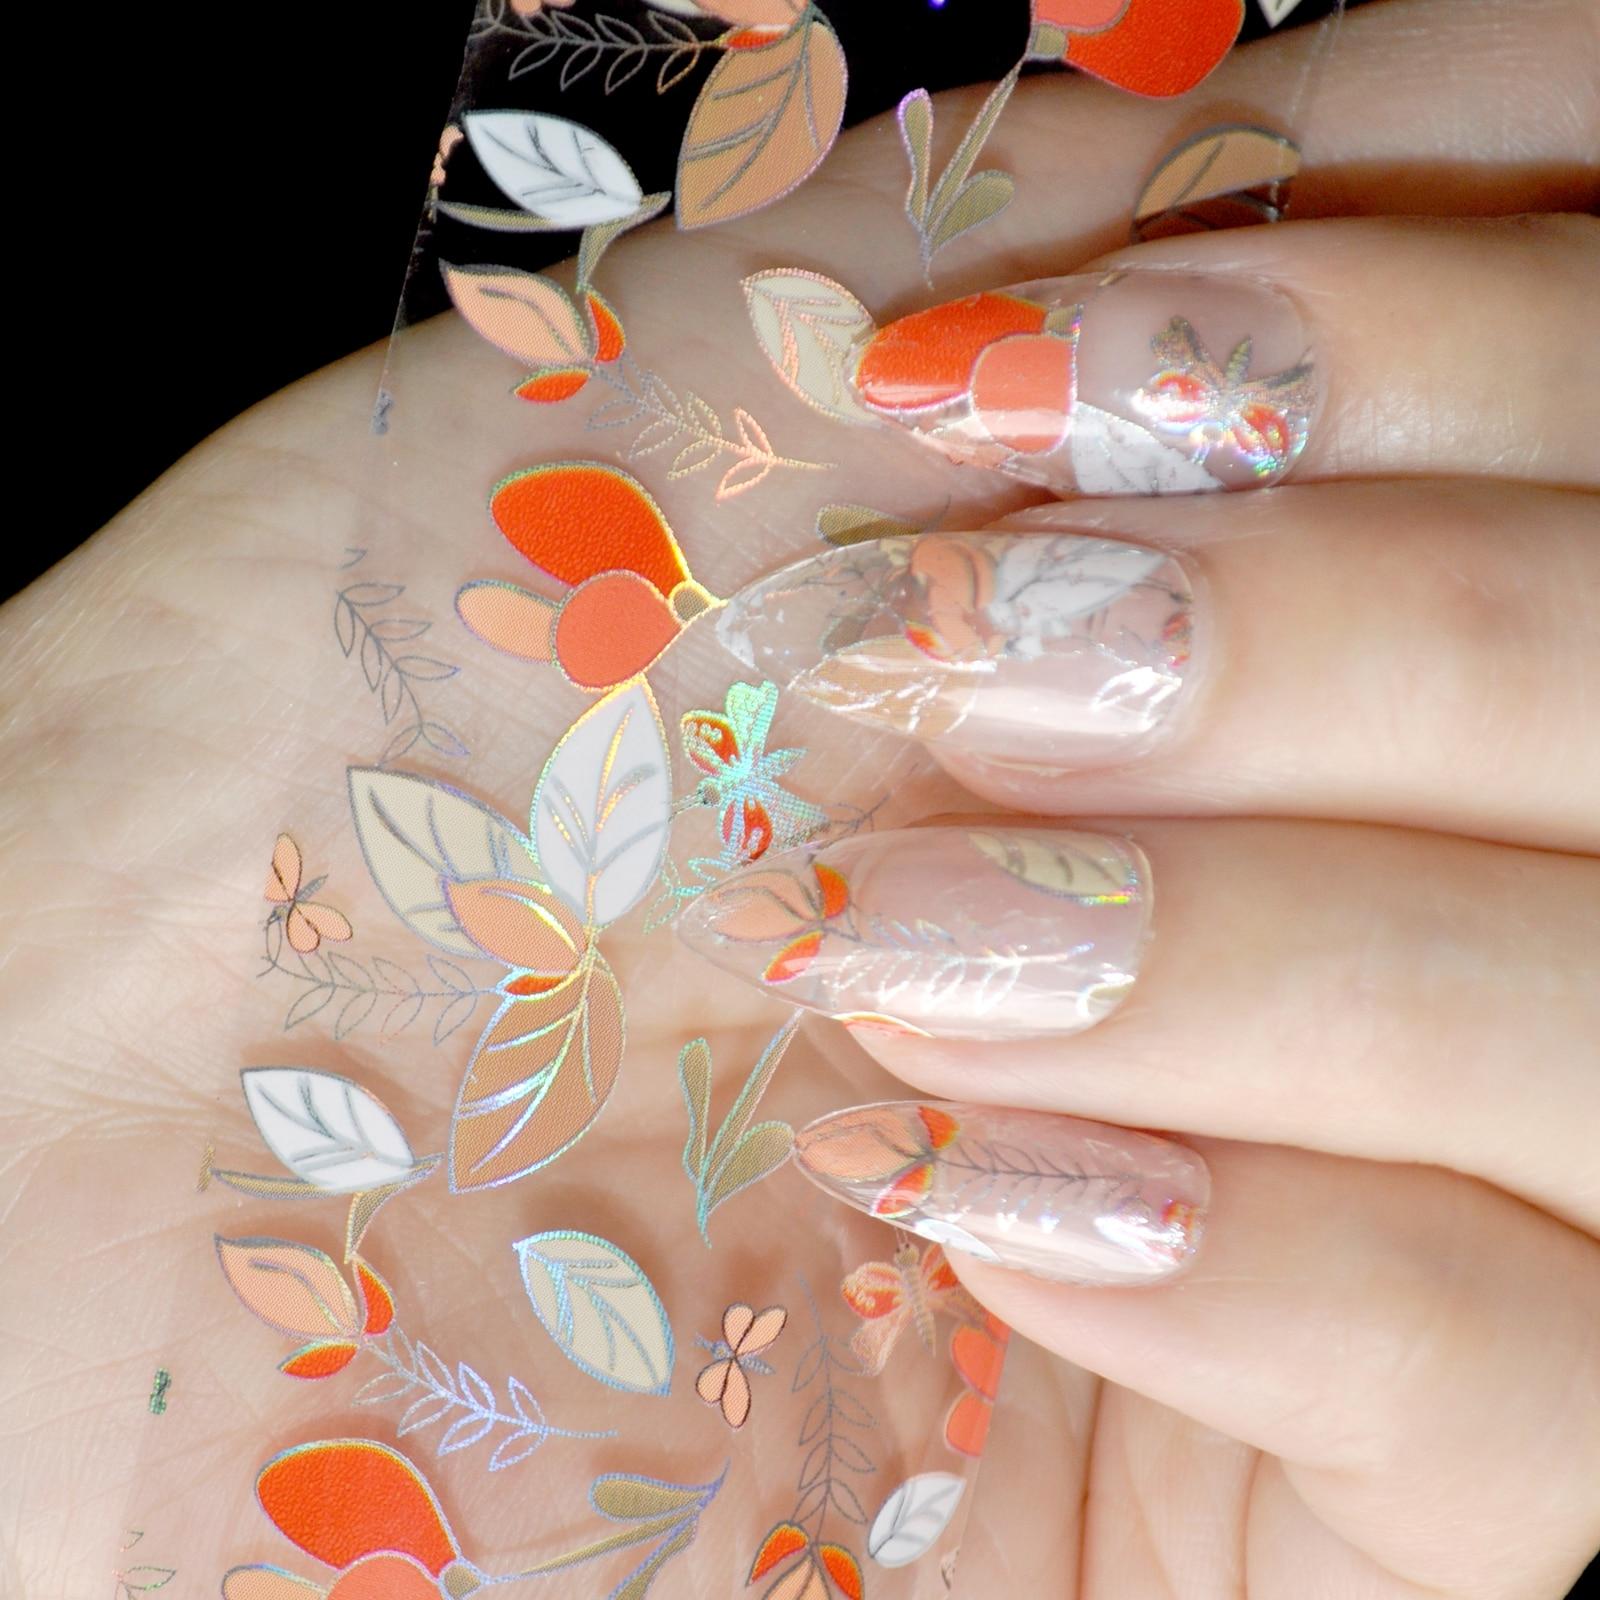 100cm x 4cm Laser Colorful Leaves Nail Art Transfer Foils Orange Leaf Dragonfly Decal Tip Glue Polish Sticker DIY Manicure Tools orange lily flowers nail art transfer foils nail sticker decal tip decoration diy manicure tools 439